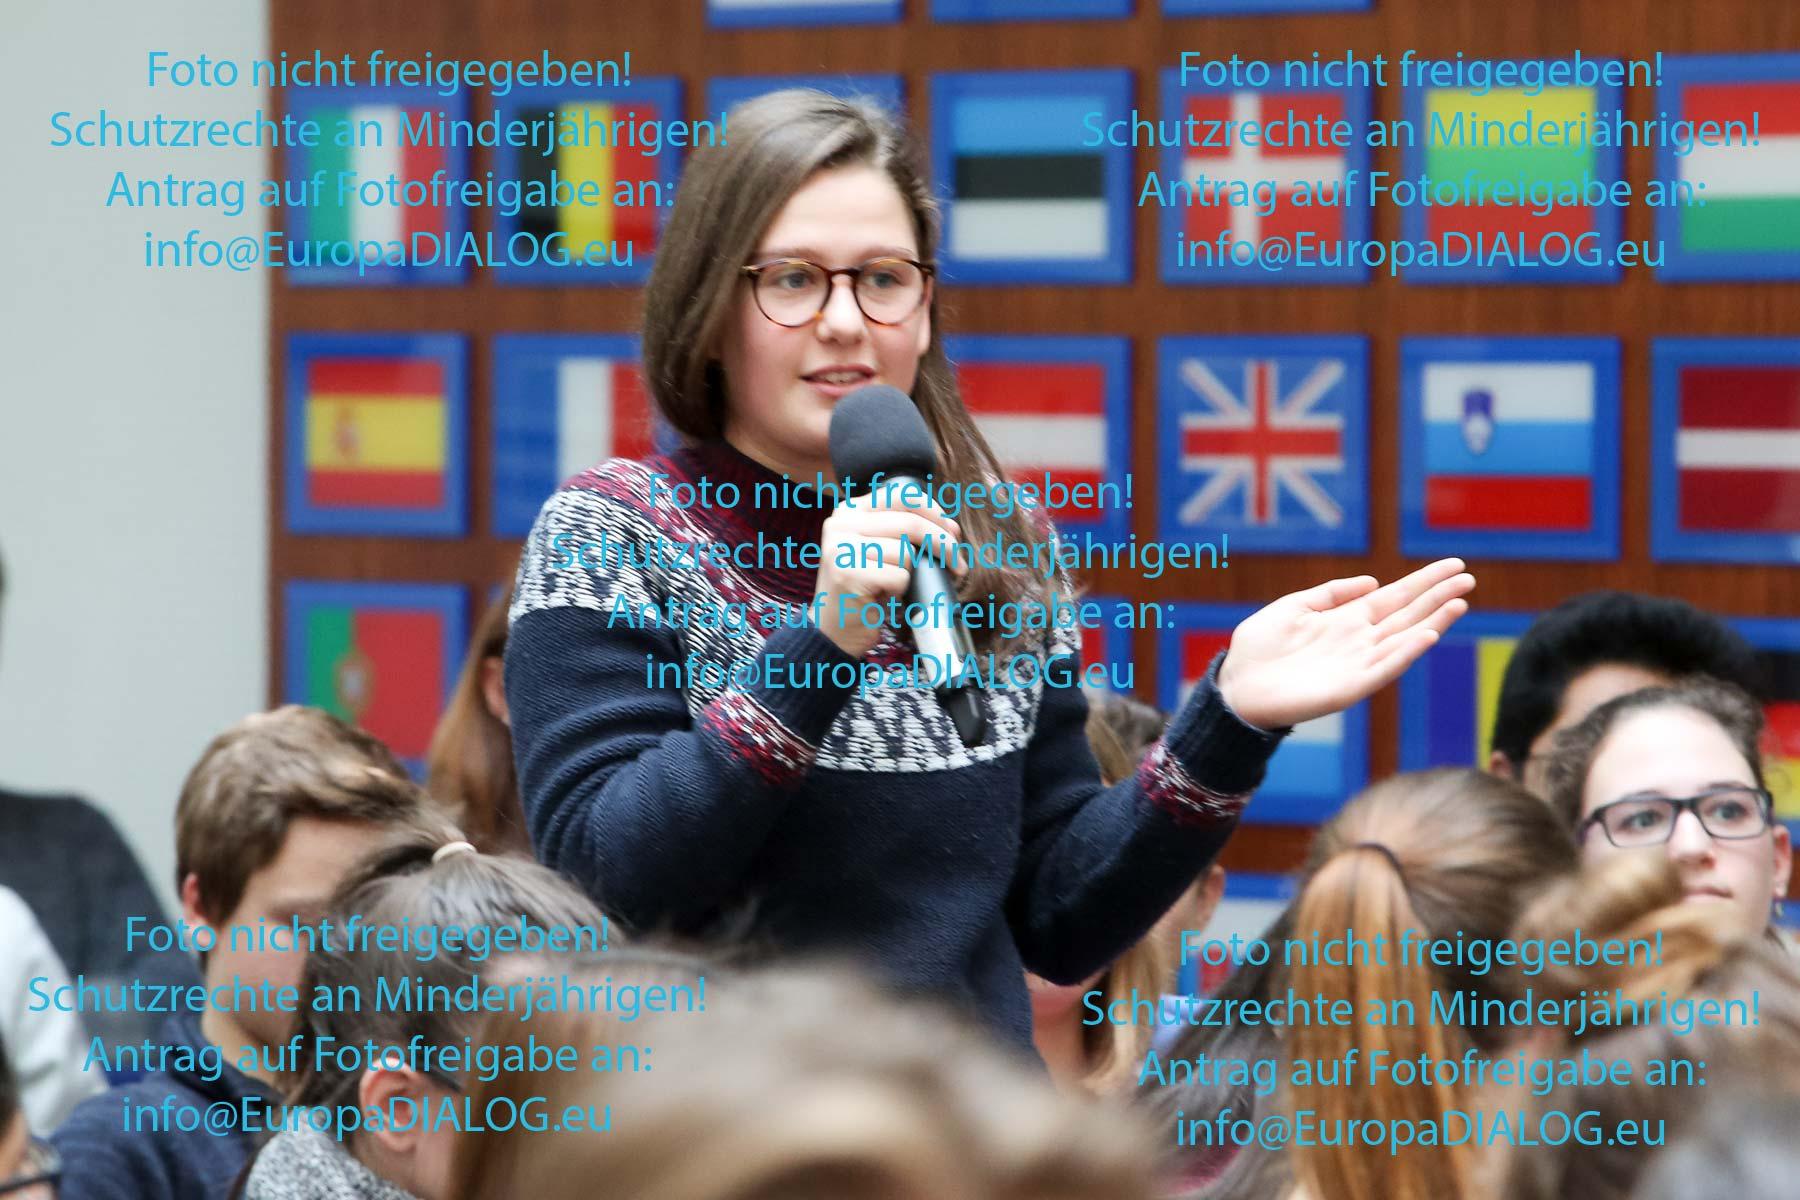 europadialog_bettina-prendergast_s_b10__421805_-katharina-schiffl__